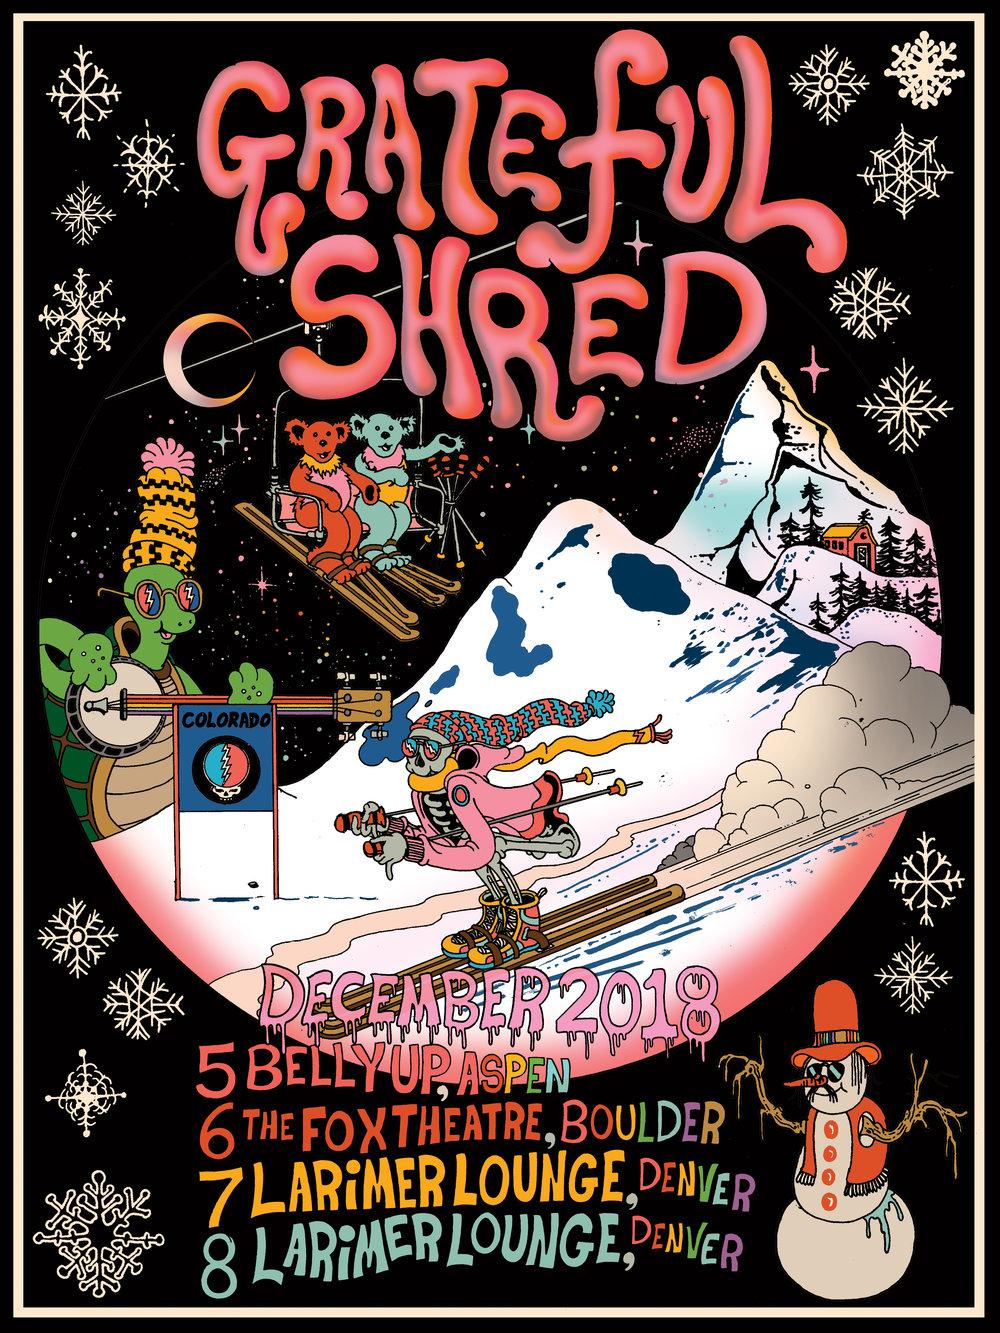 Grateful Shred Colorado 2018.jpg